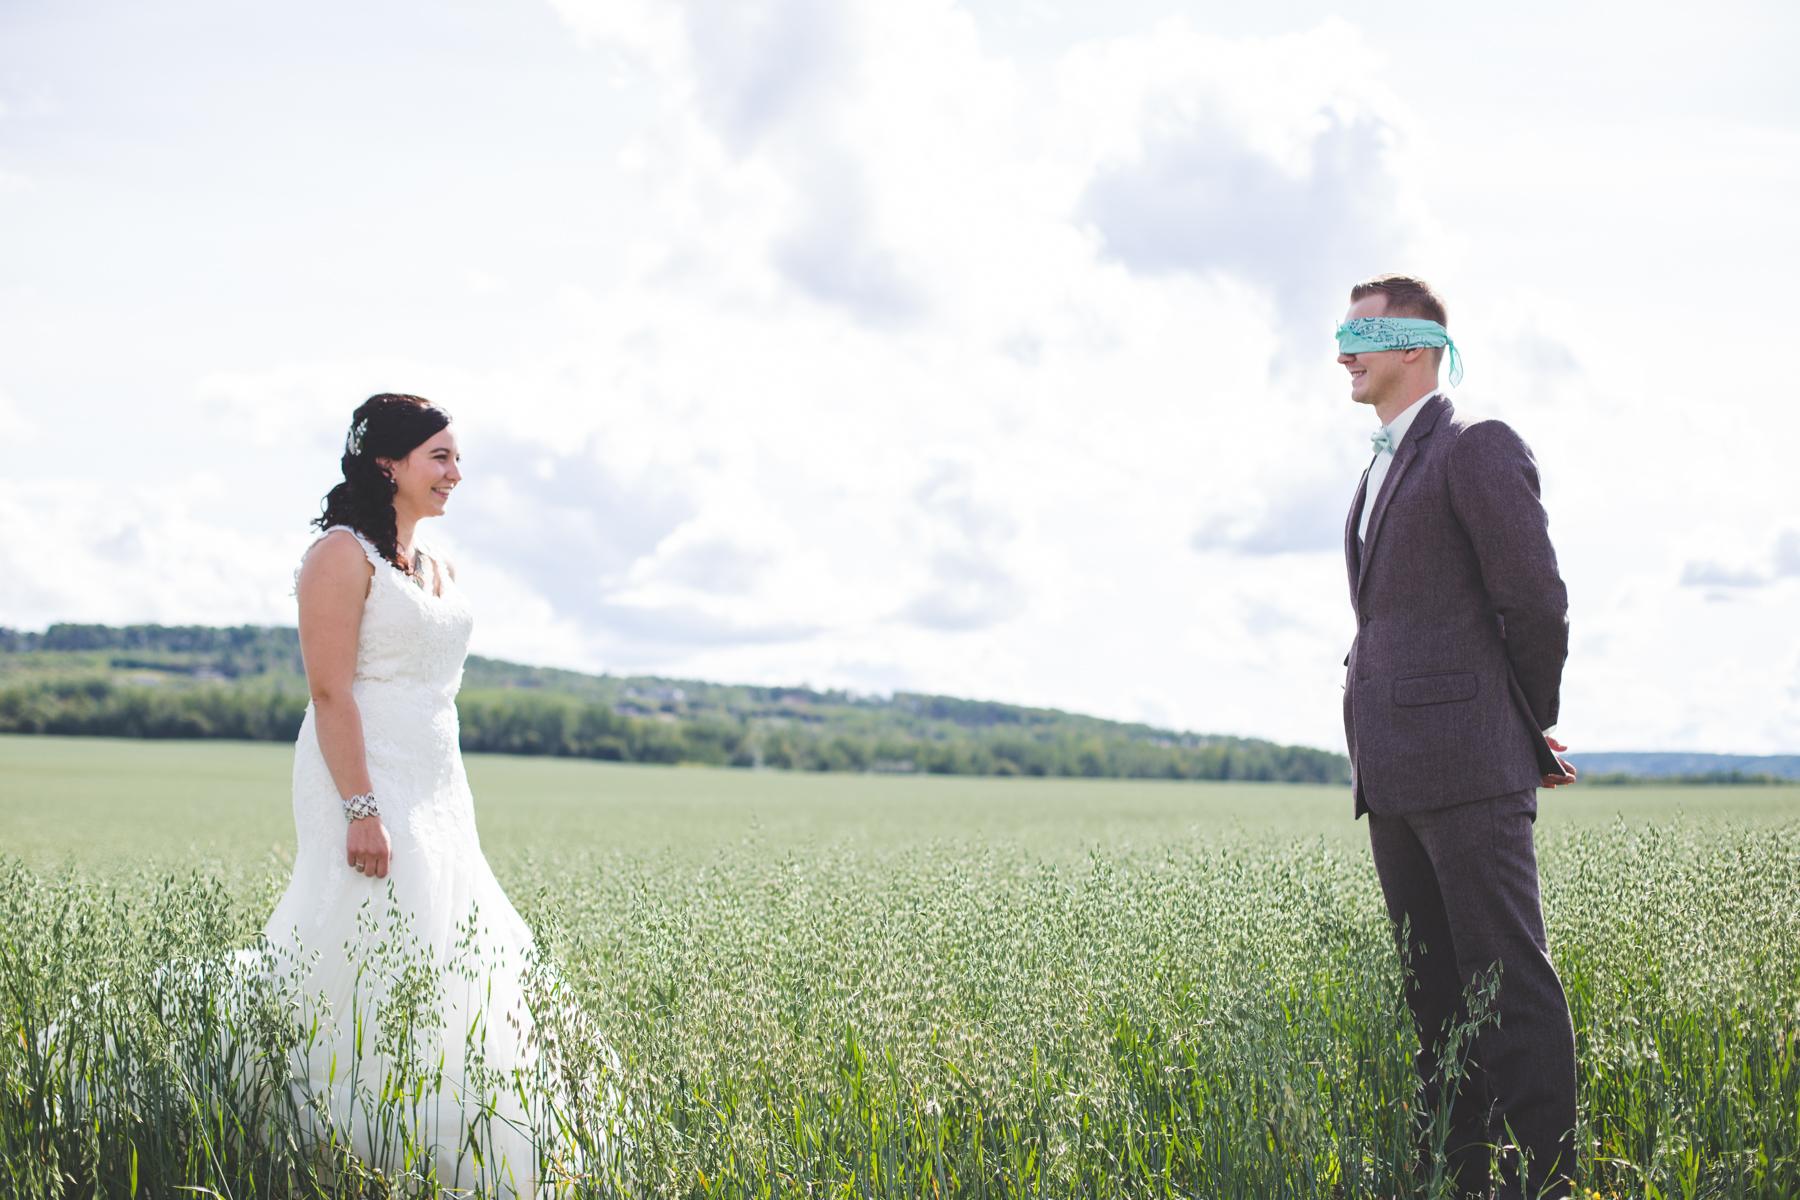 20150808-oglovewedding-487.jpg